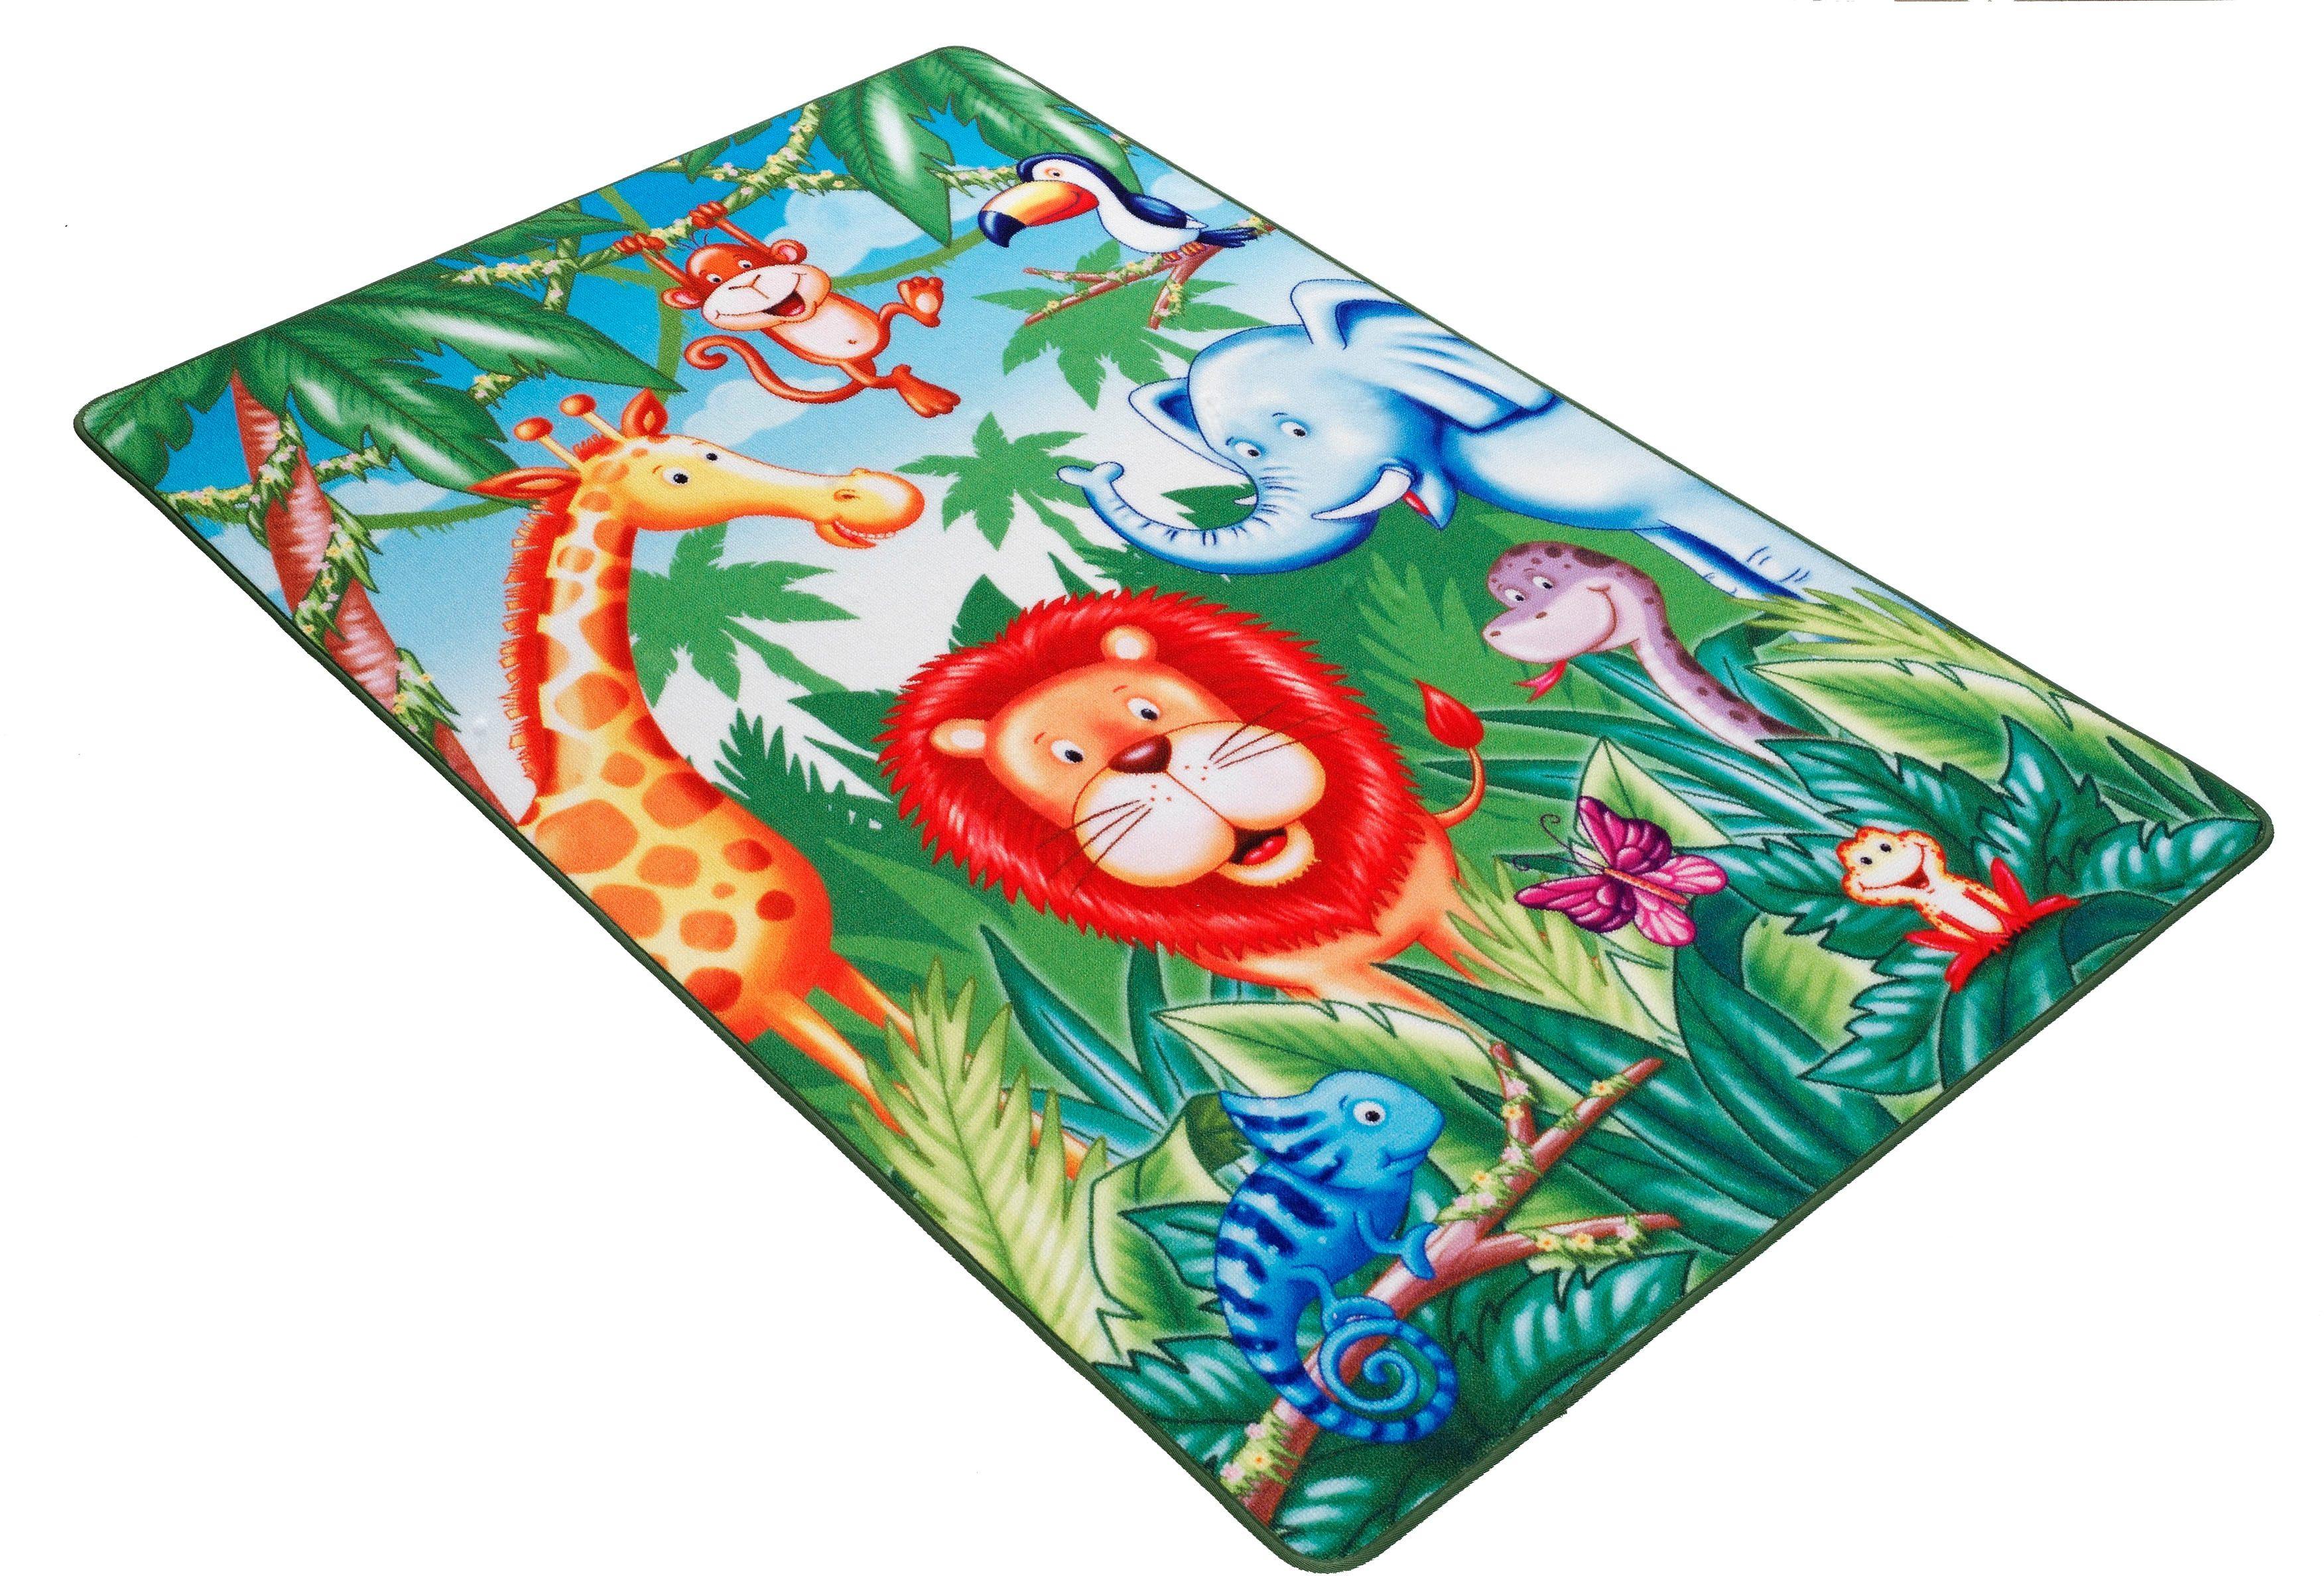 Kinderteppich Lovely Kids LK-6 Böing Carpet rechteckig Höhe 2 mm